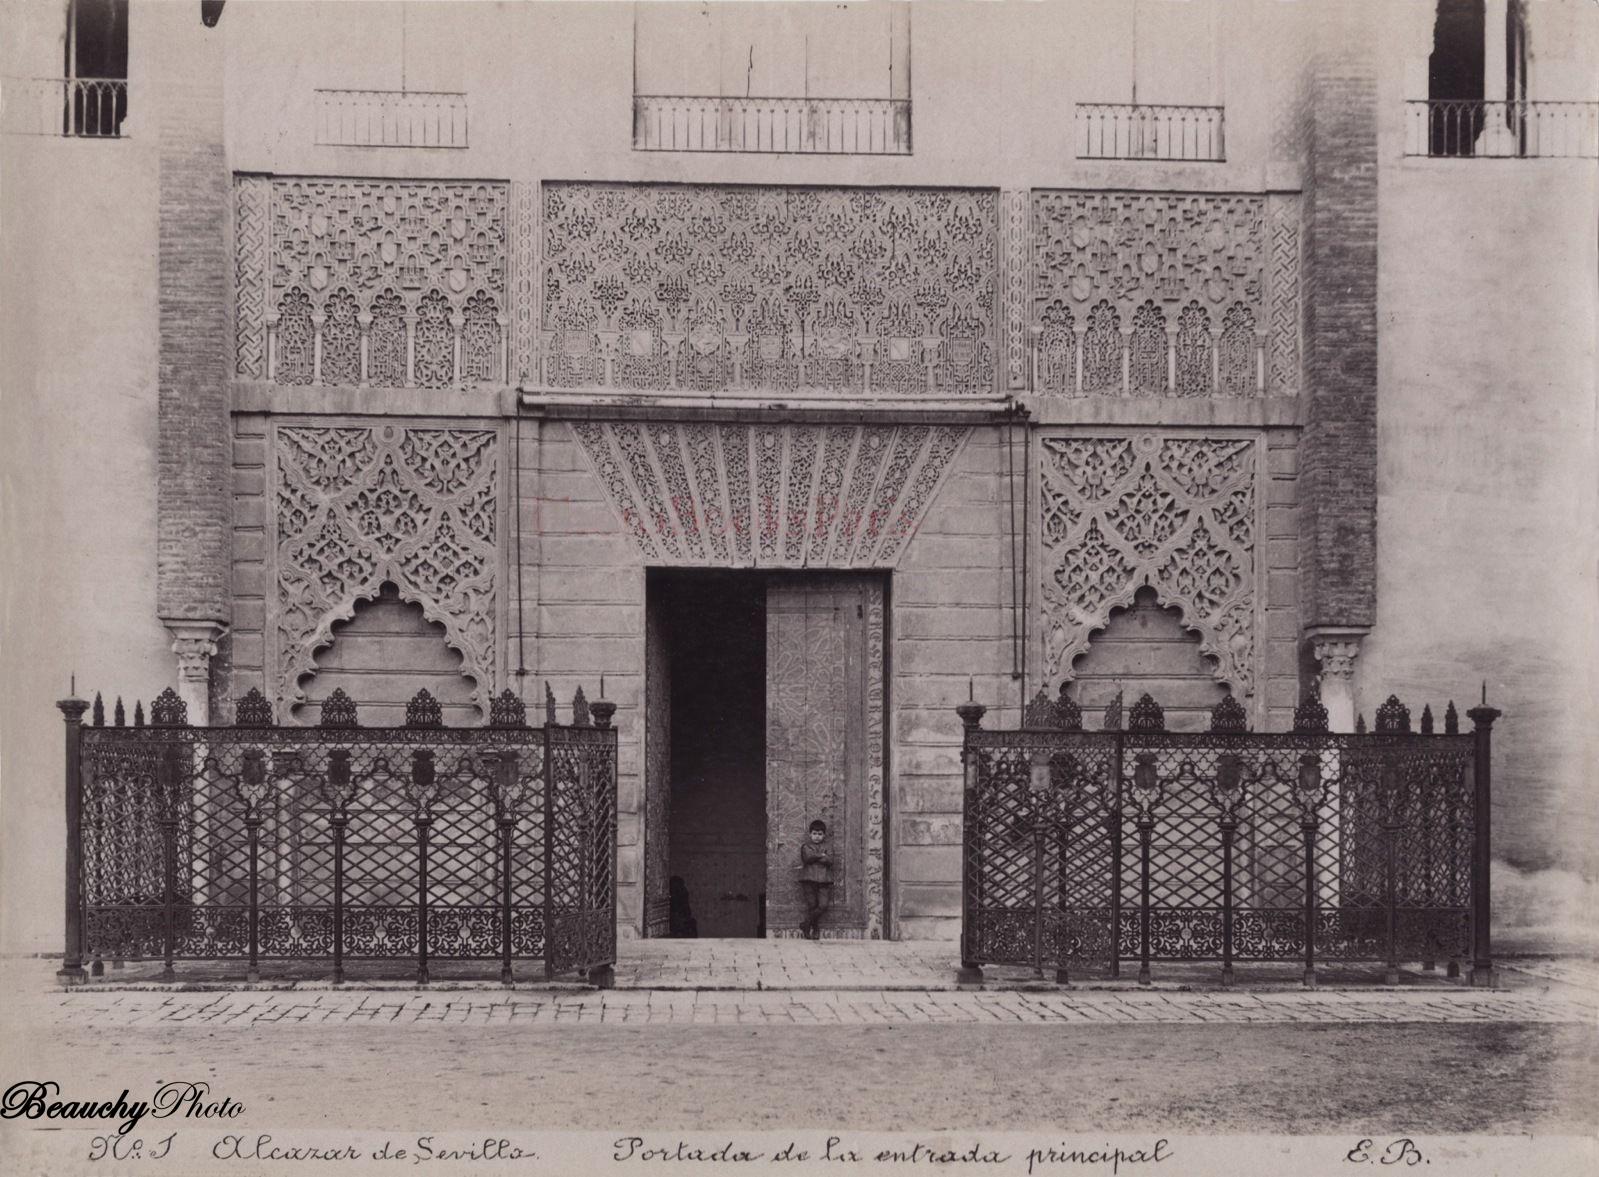 Niño_Beauchyphoto_Portada_Alcázar_de_Sevilla_Emilio_Beauchy_Cano_fotografias_antiguas_postales_vistas_y_monumentos